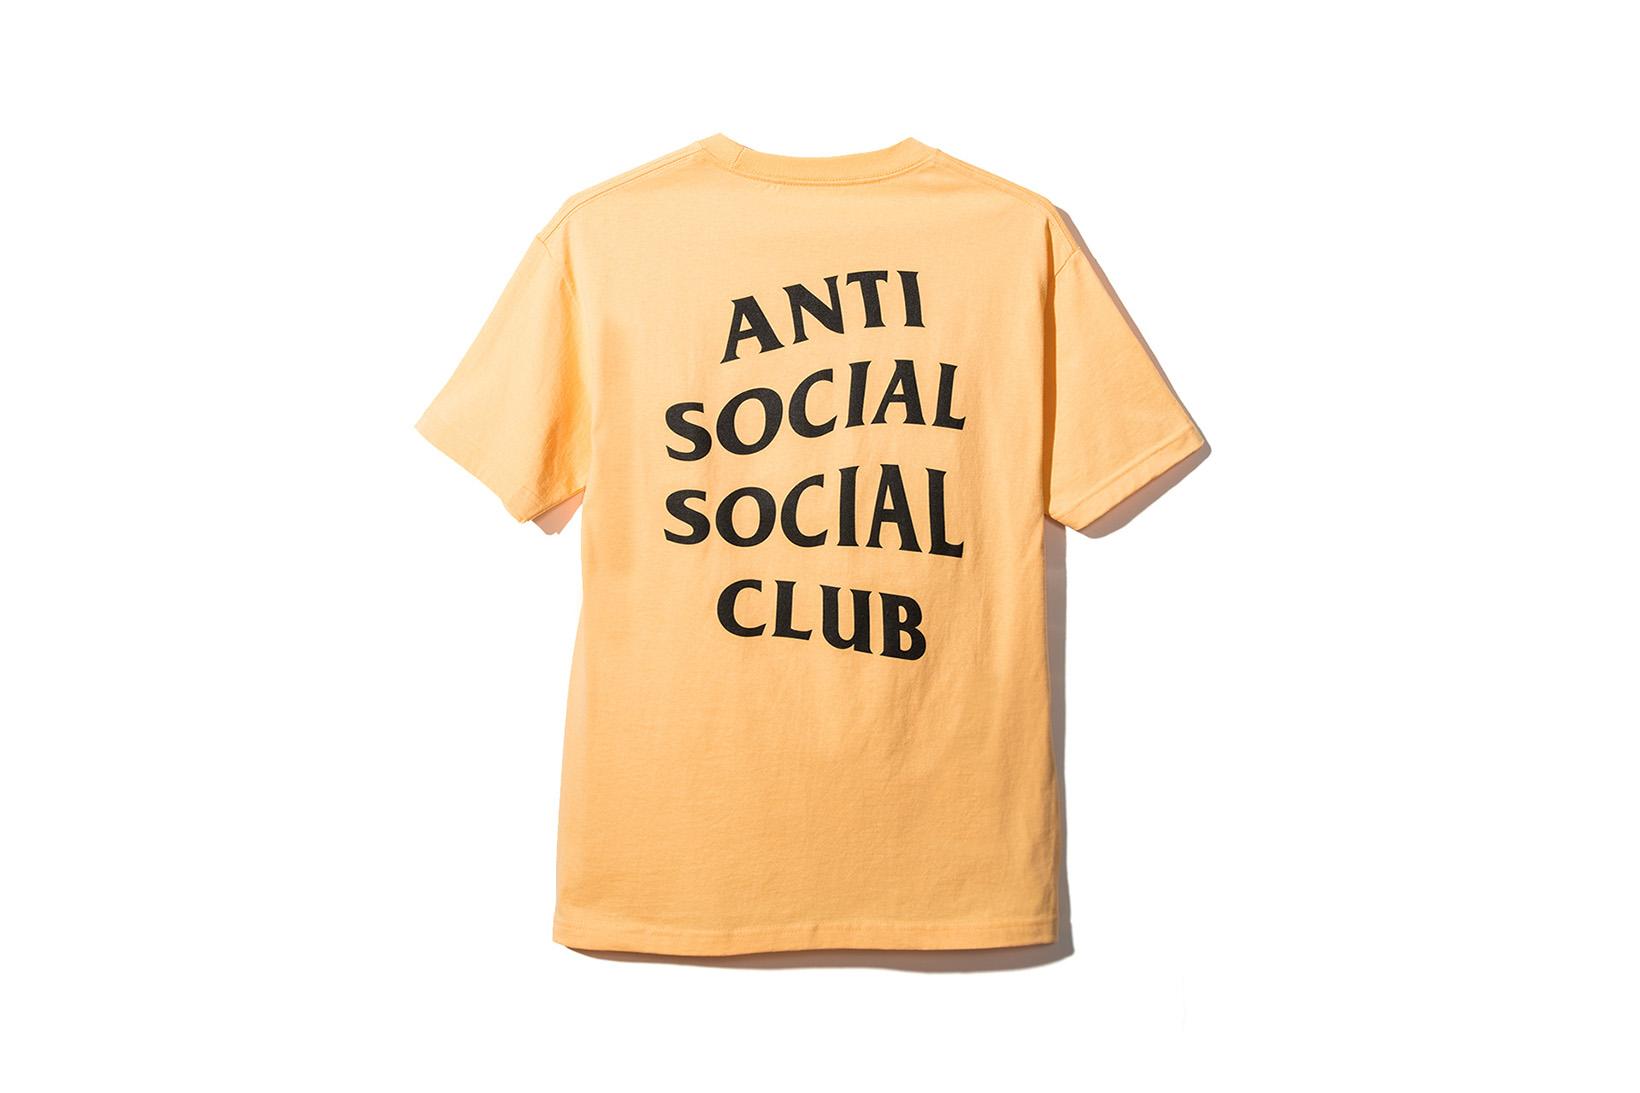 Anti Social Social Club 2017 Spring Summer - 3744355